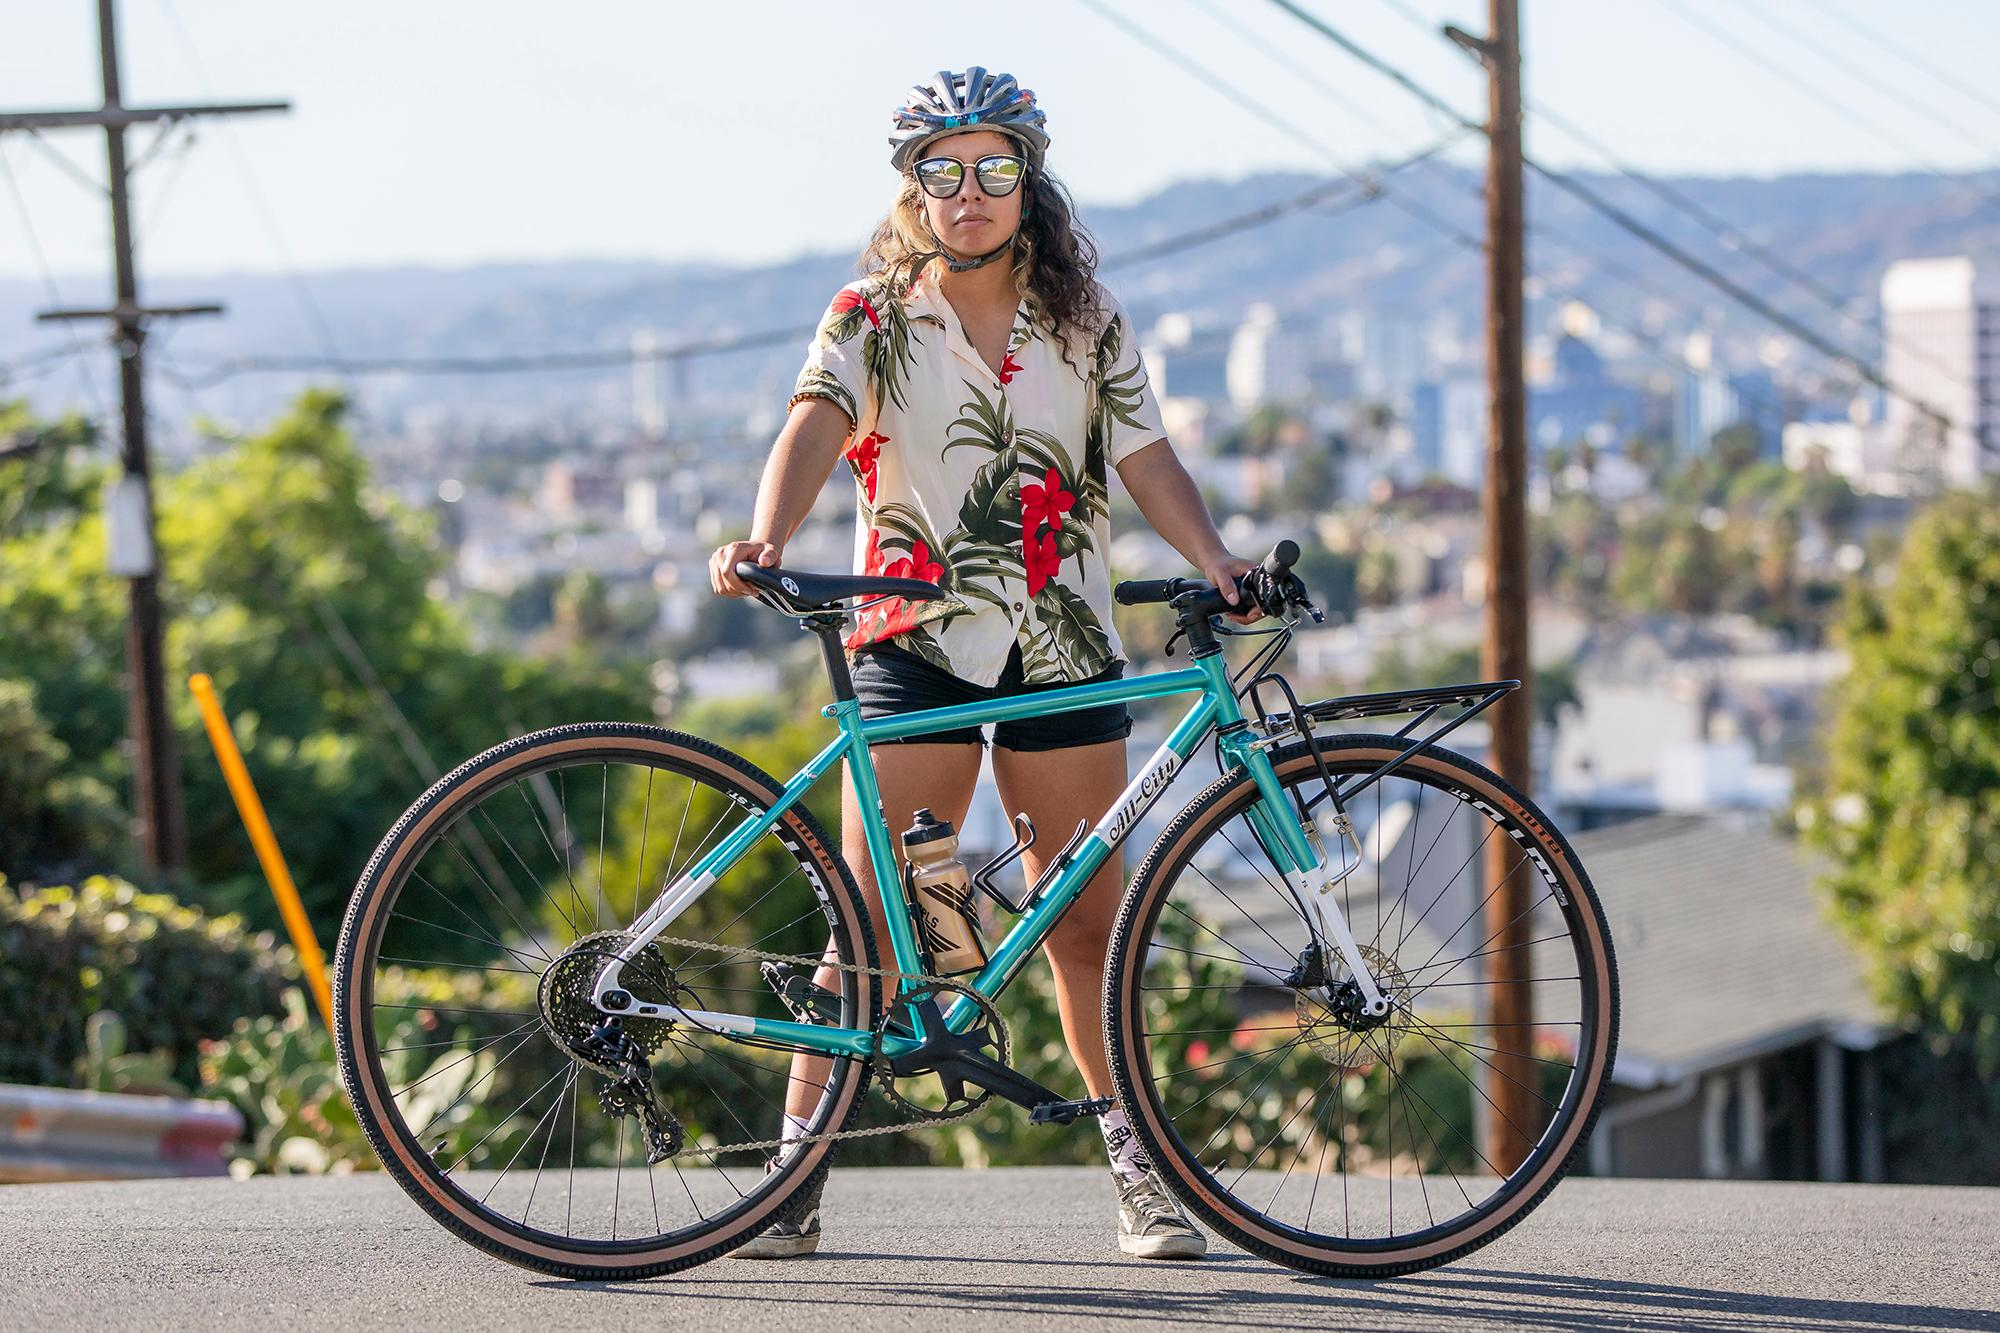 All-City Announces the Super Professional City Bike